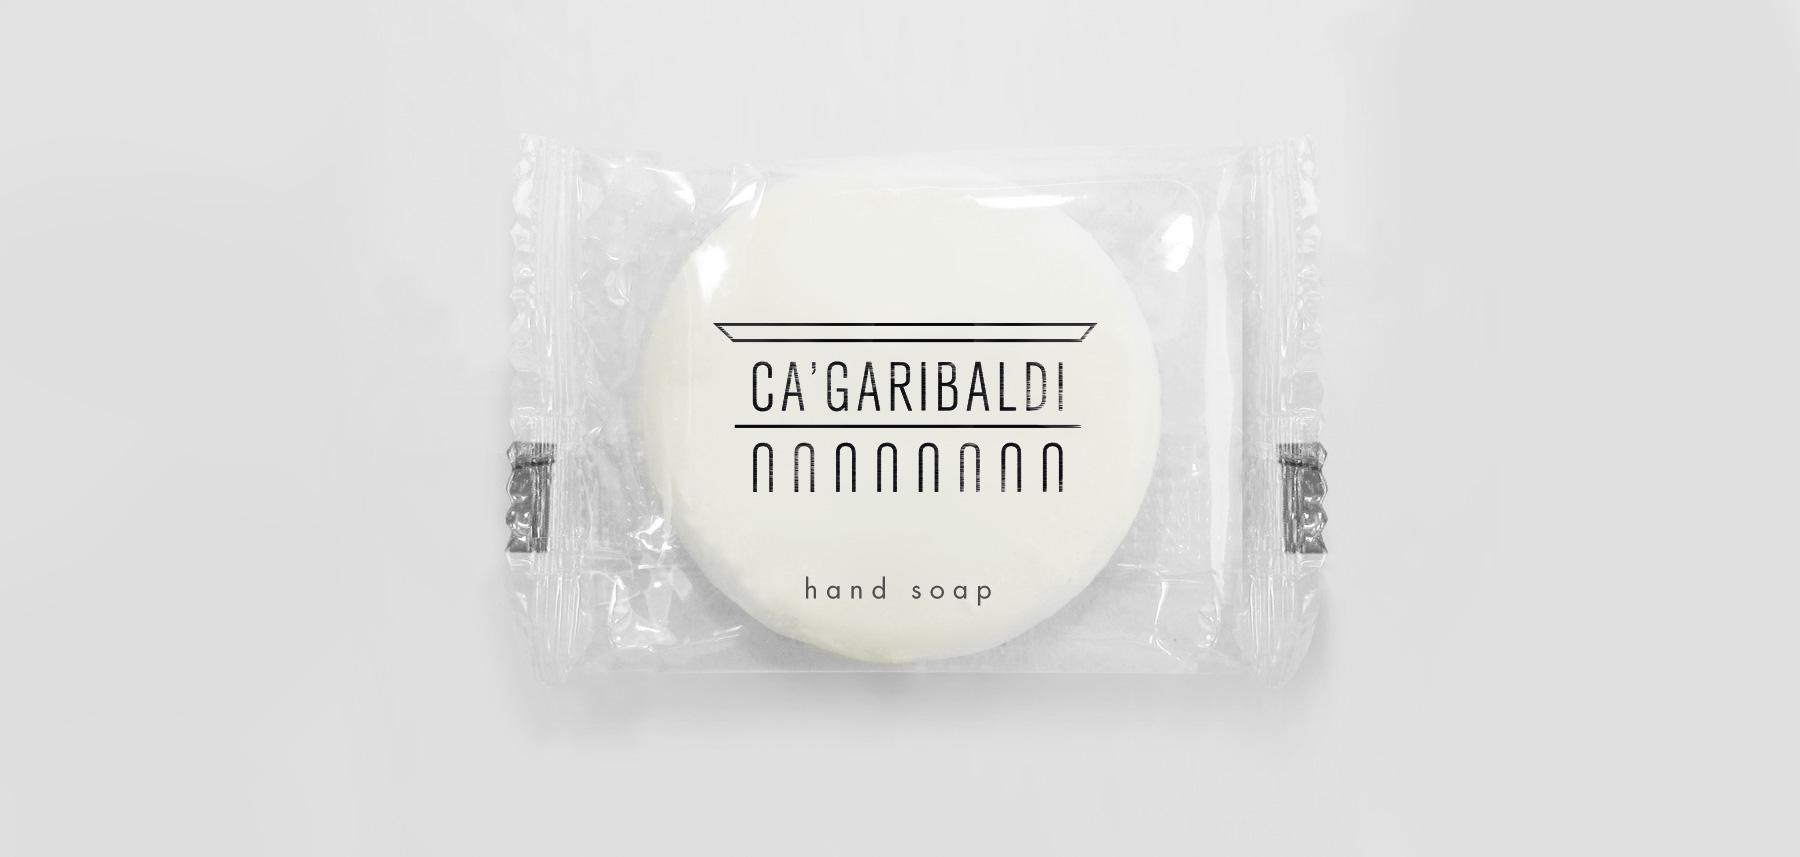 Ca'Garibaldi emballage savon logotype